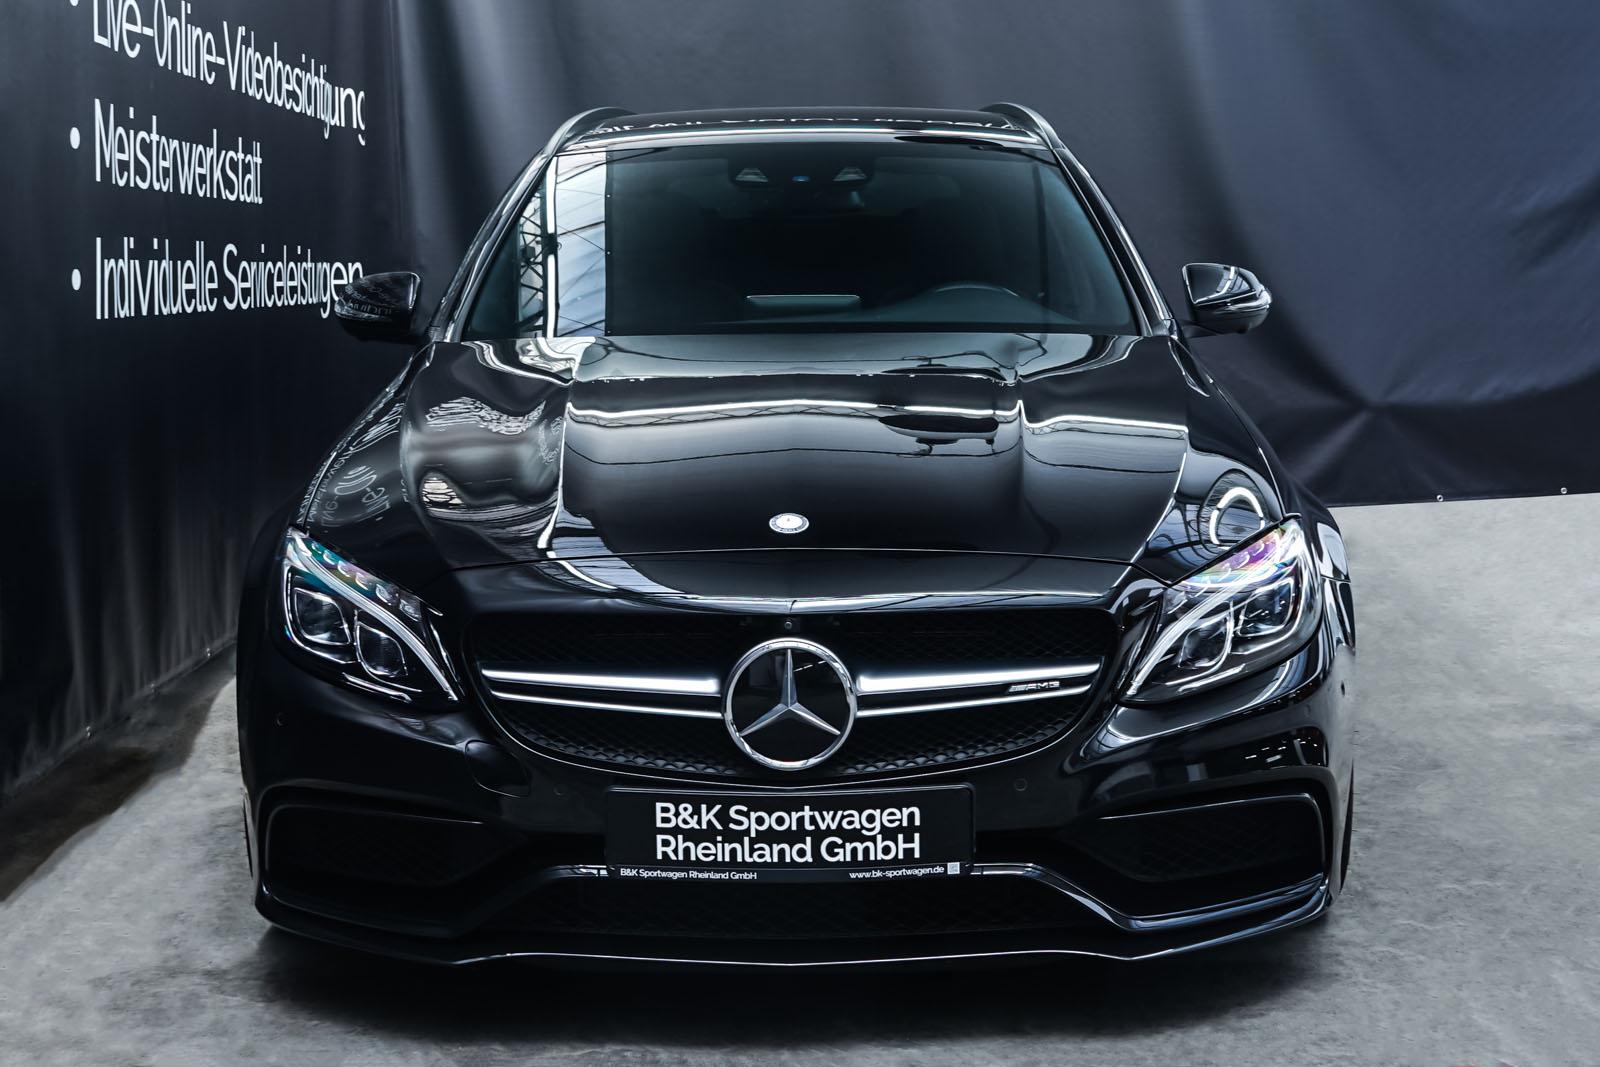 MercedesBenz_C63AMG_TModell_Schwarz_Schwarz_MB-9387_1_w